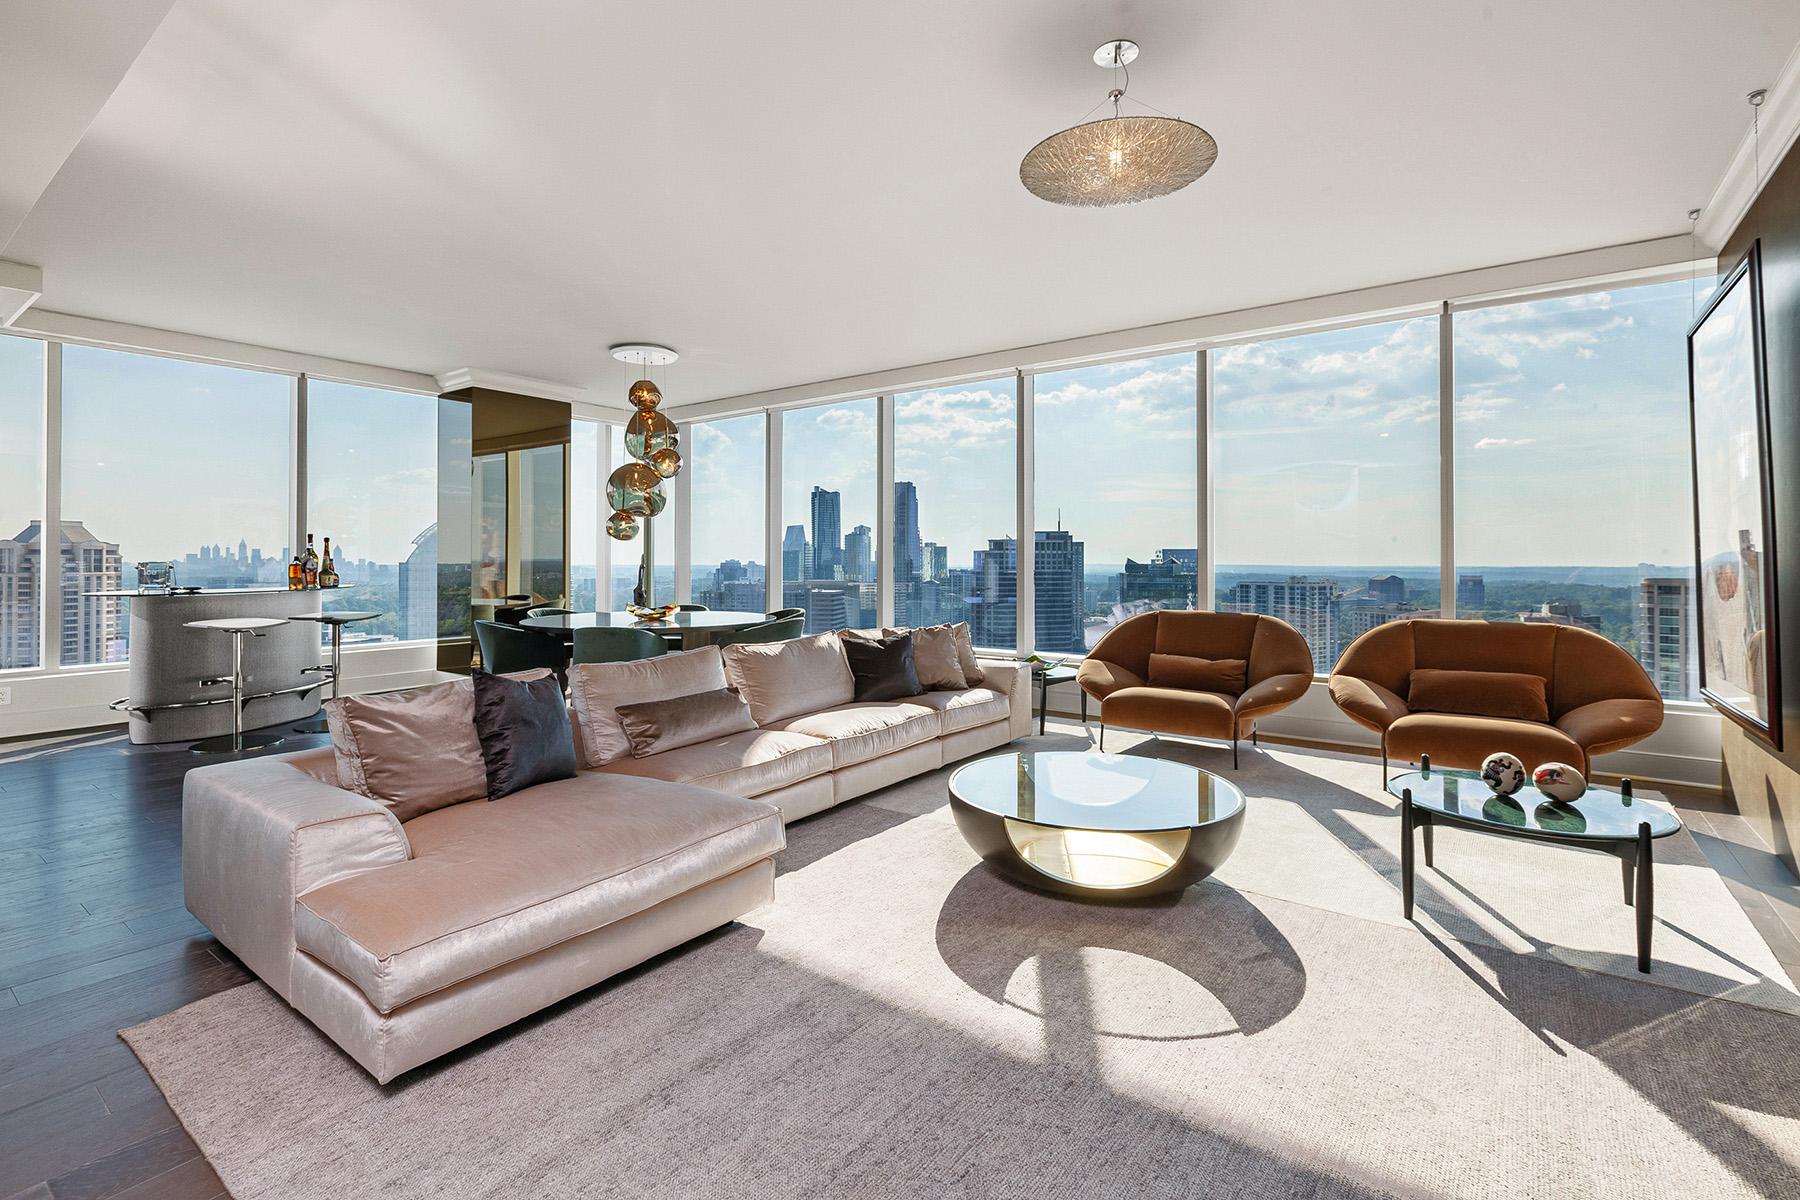 Condominiums для того Продажа на Stunning Ritz-Carlton Residences Buckhead Condo 3630 Peachtree Road NE No. 2103, Atlanta, Джорджия 30326 Соединенные Штаты